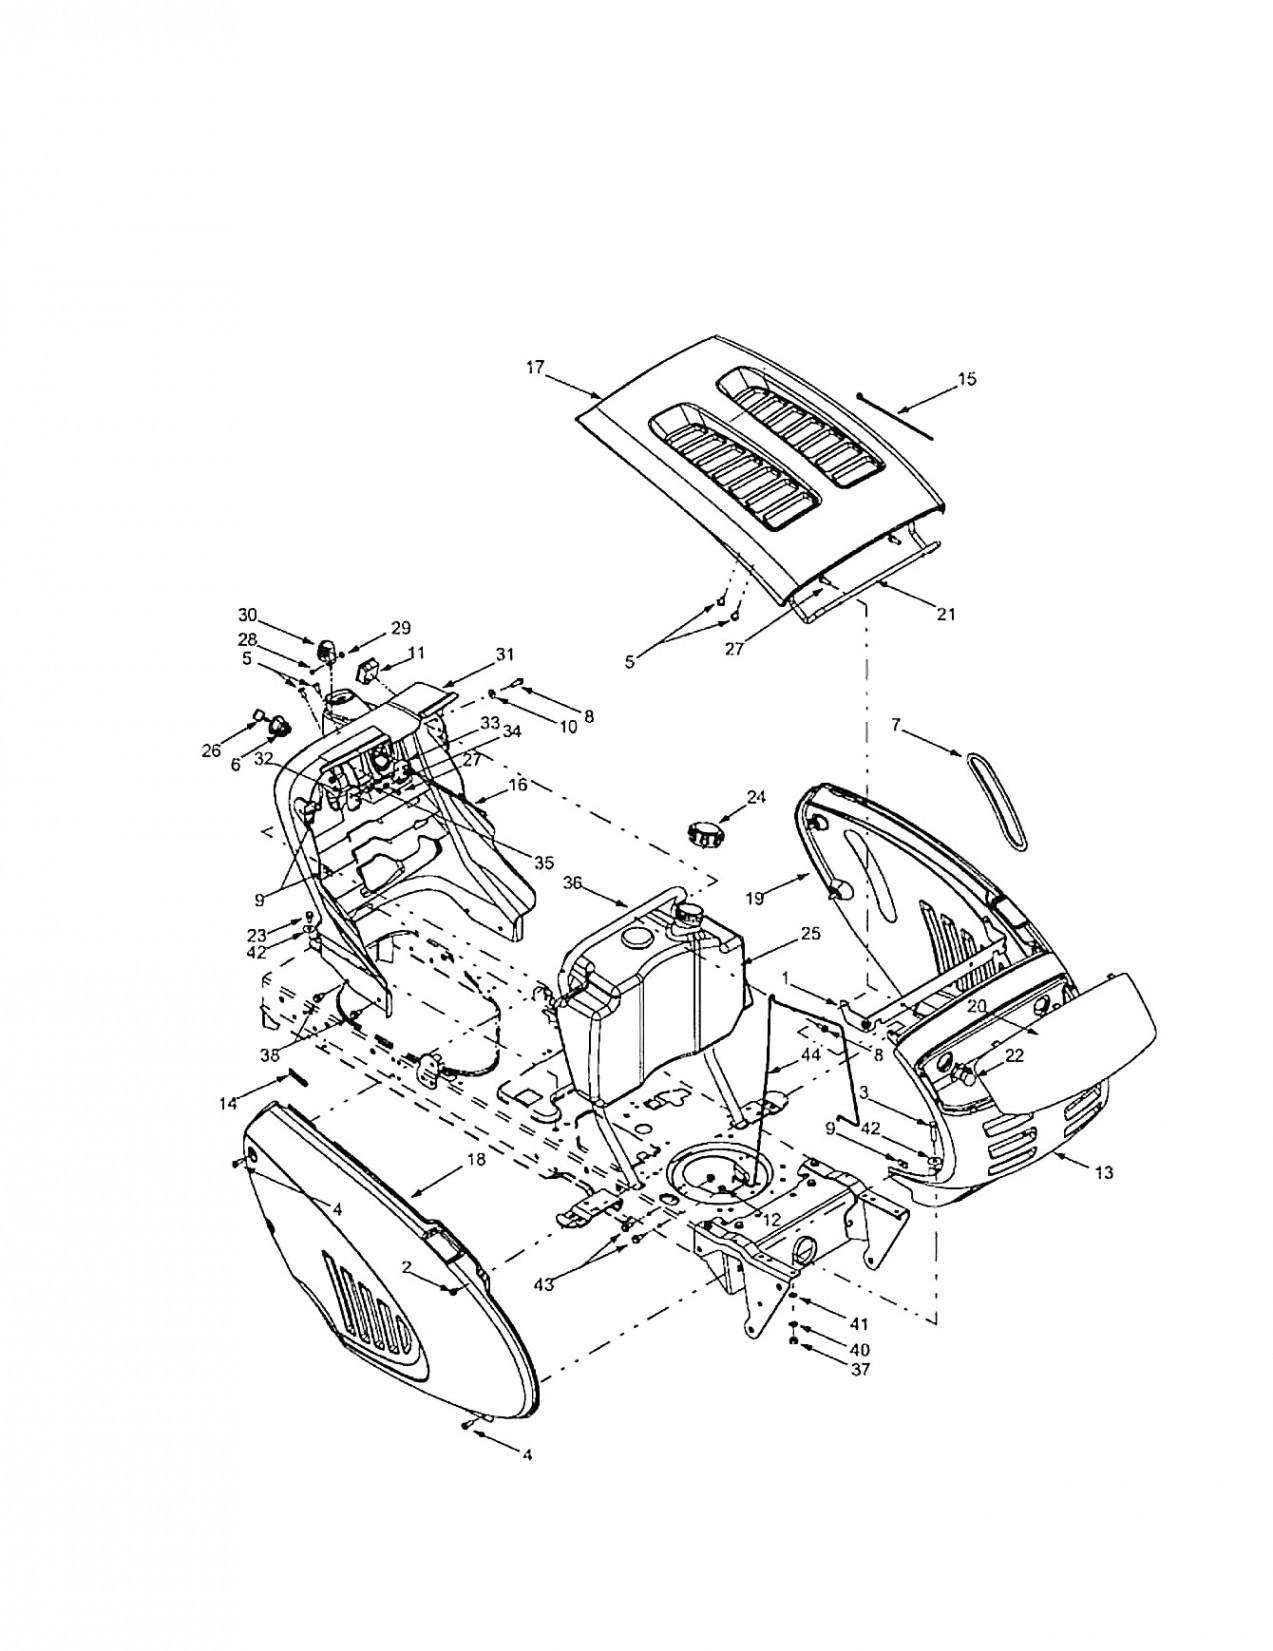 Troy Bilt Lawn Mower Parts >> Troy Bilt Horse Lawn Tractor Wiring Diagram Wiring Diagram